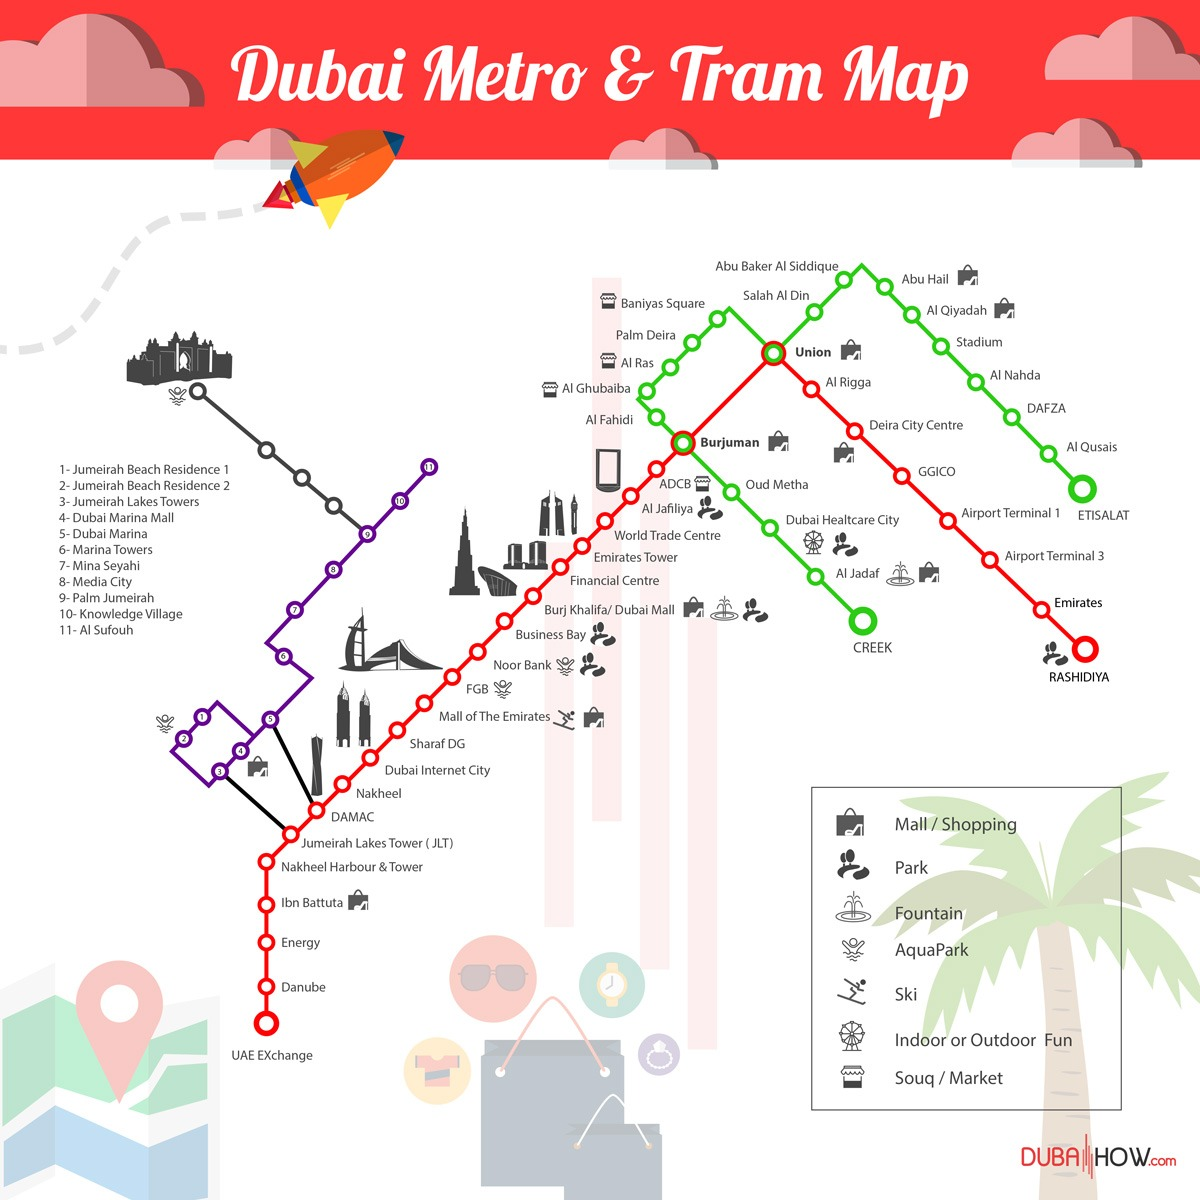 Dubai Metro Map High Resolution + Dubai Tram